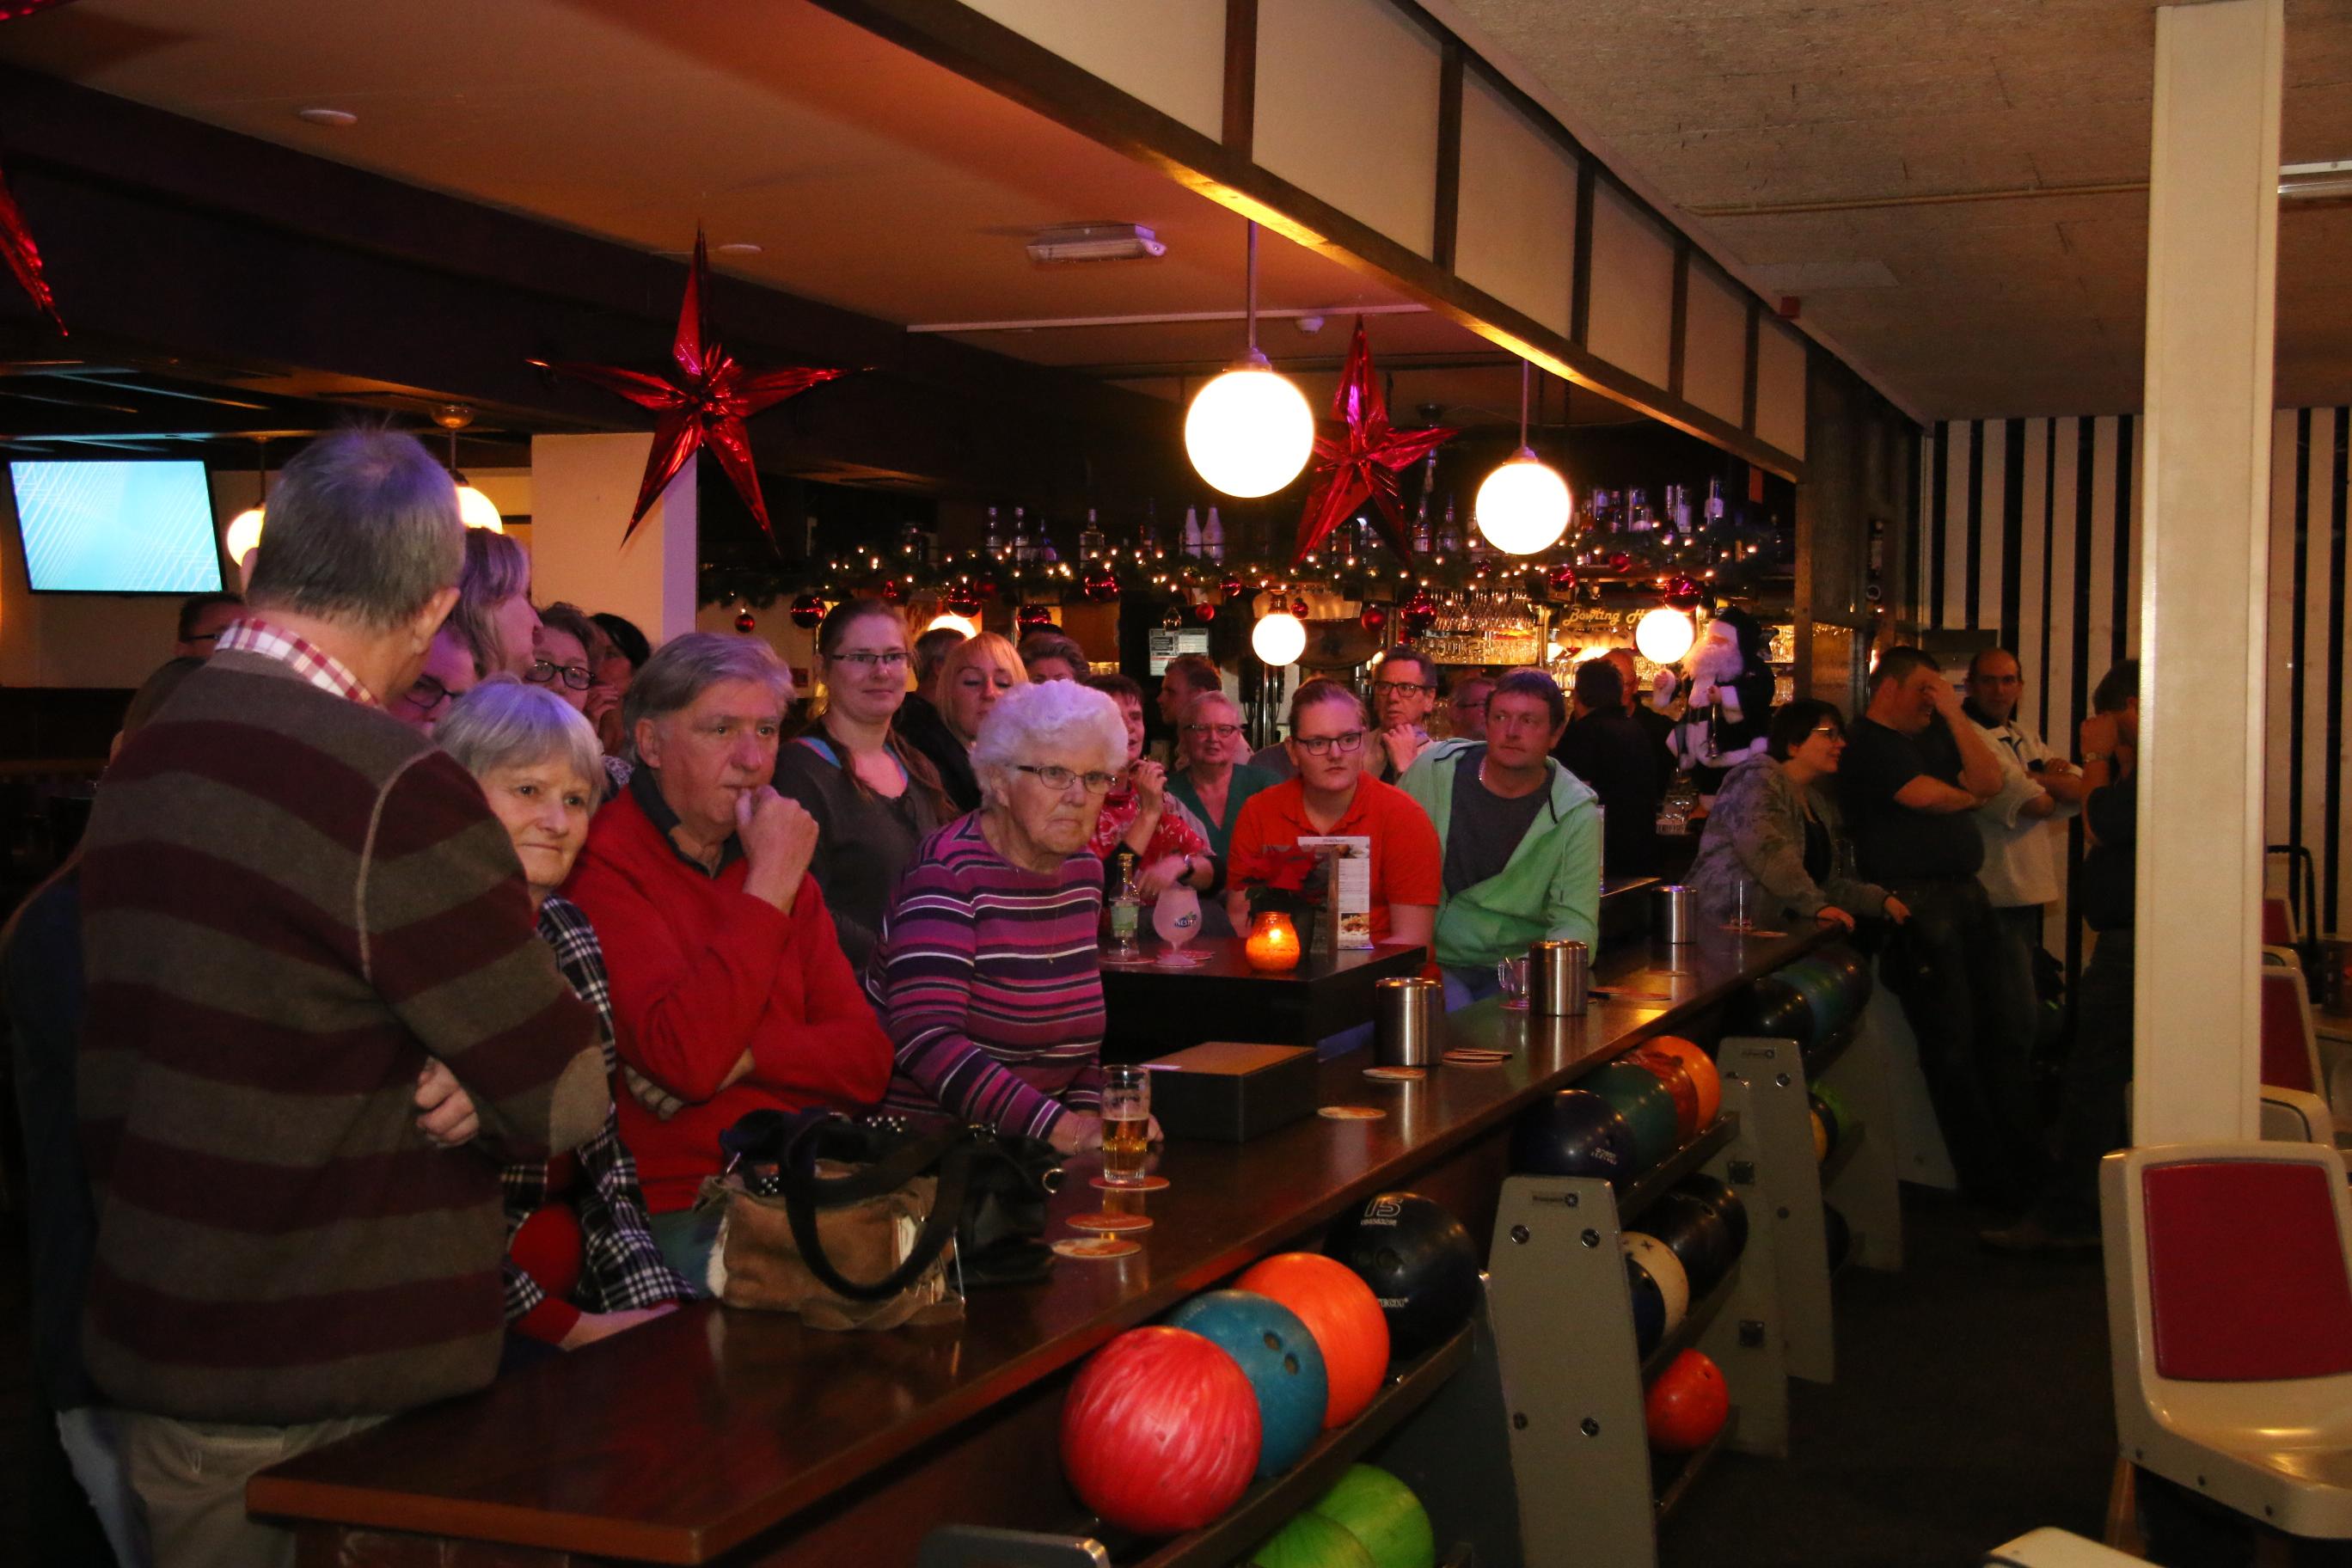 http://www.bowlingverenigingheiloo.nl/fotos_verhalen/foto's/2016_1222-Kerst-Publiek.jpg